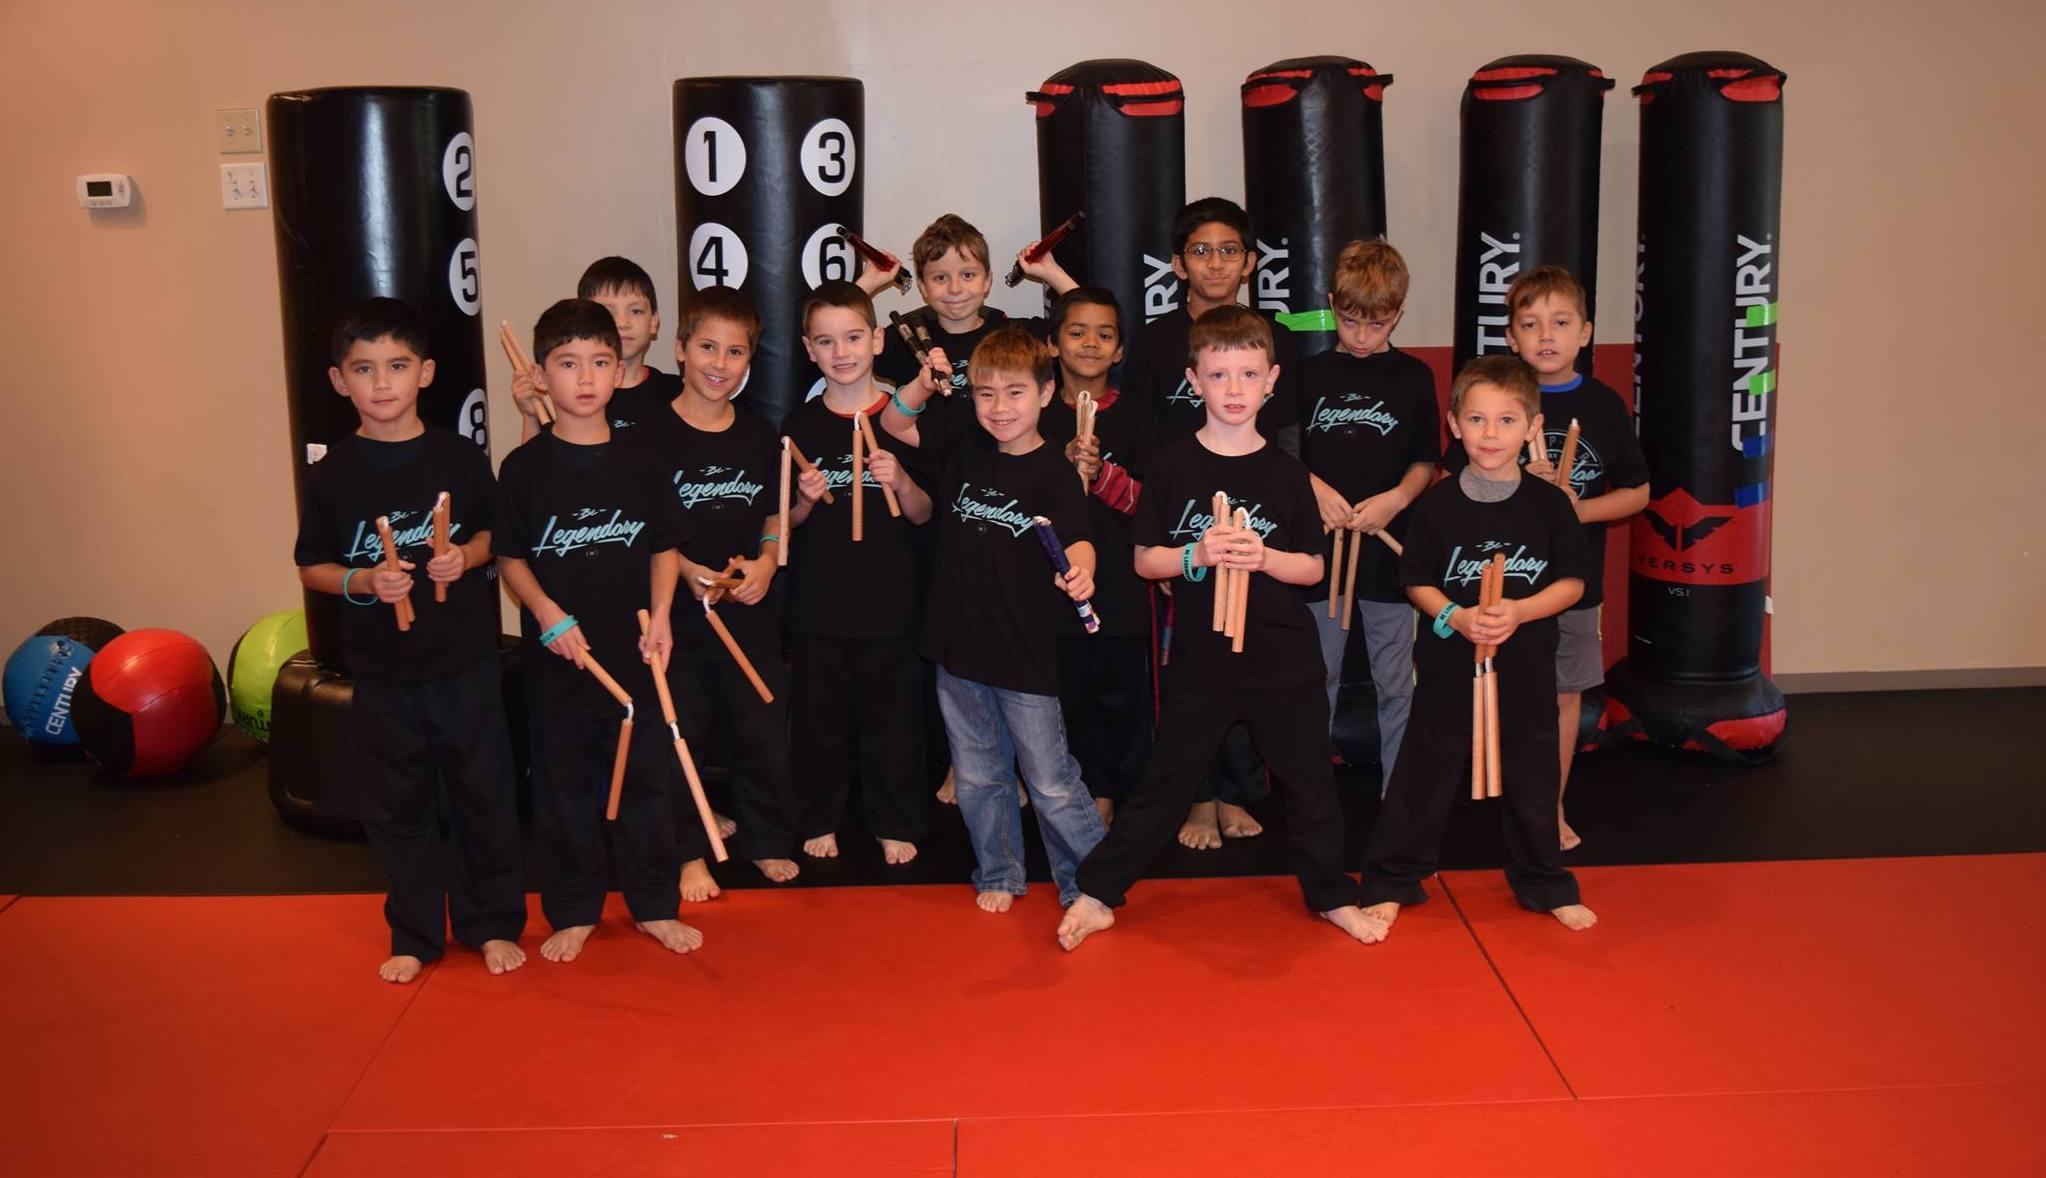 Sudbury's Leader in Martial Arts and Self Defense Training